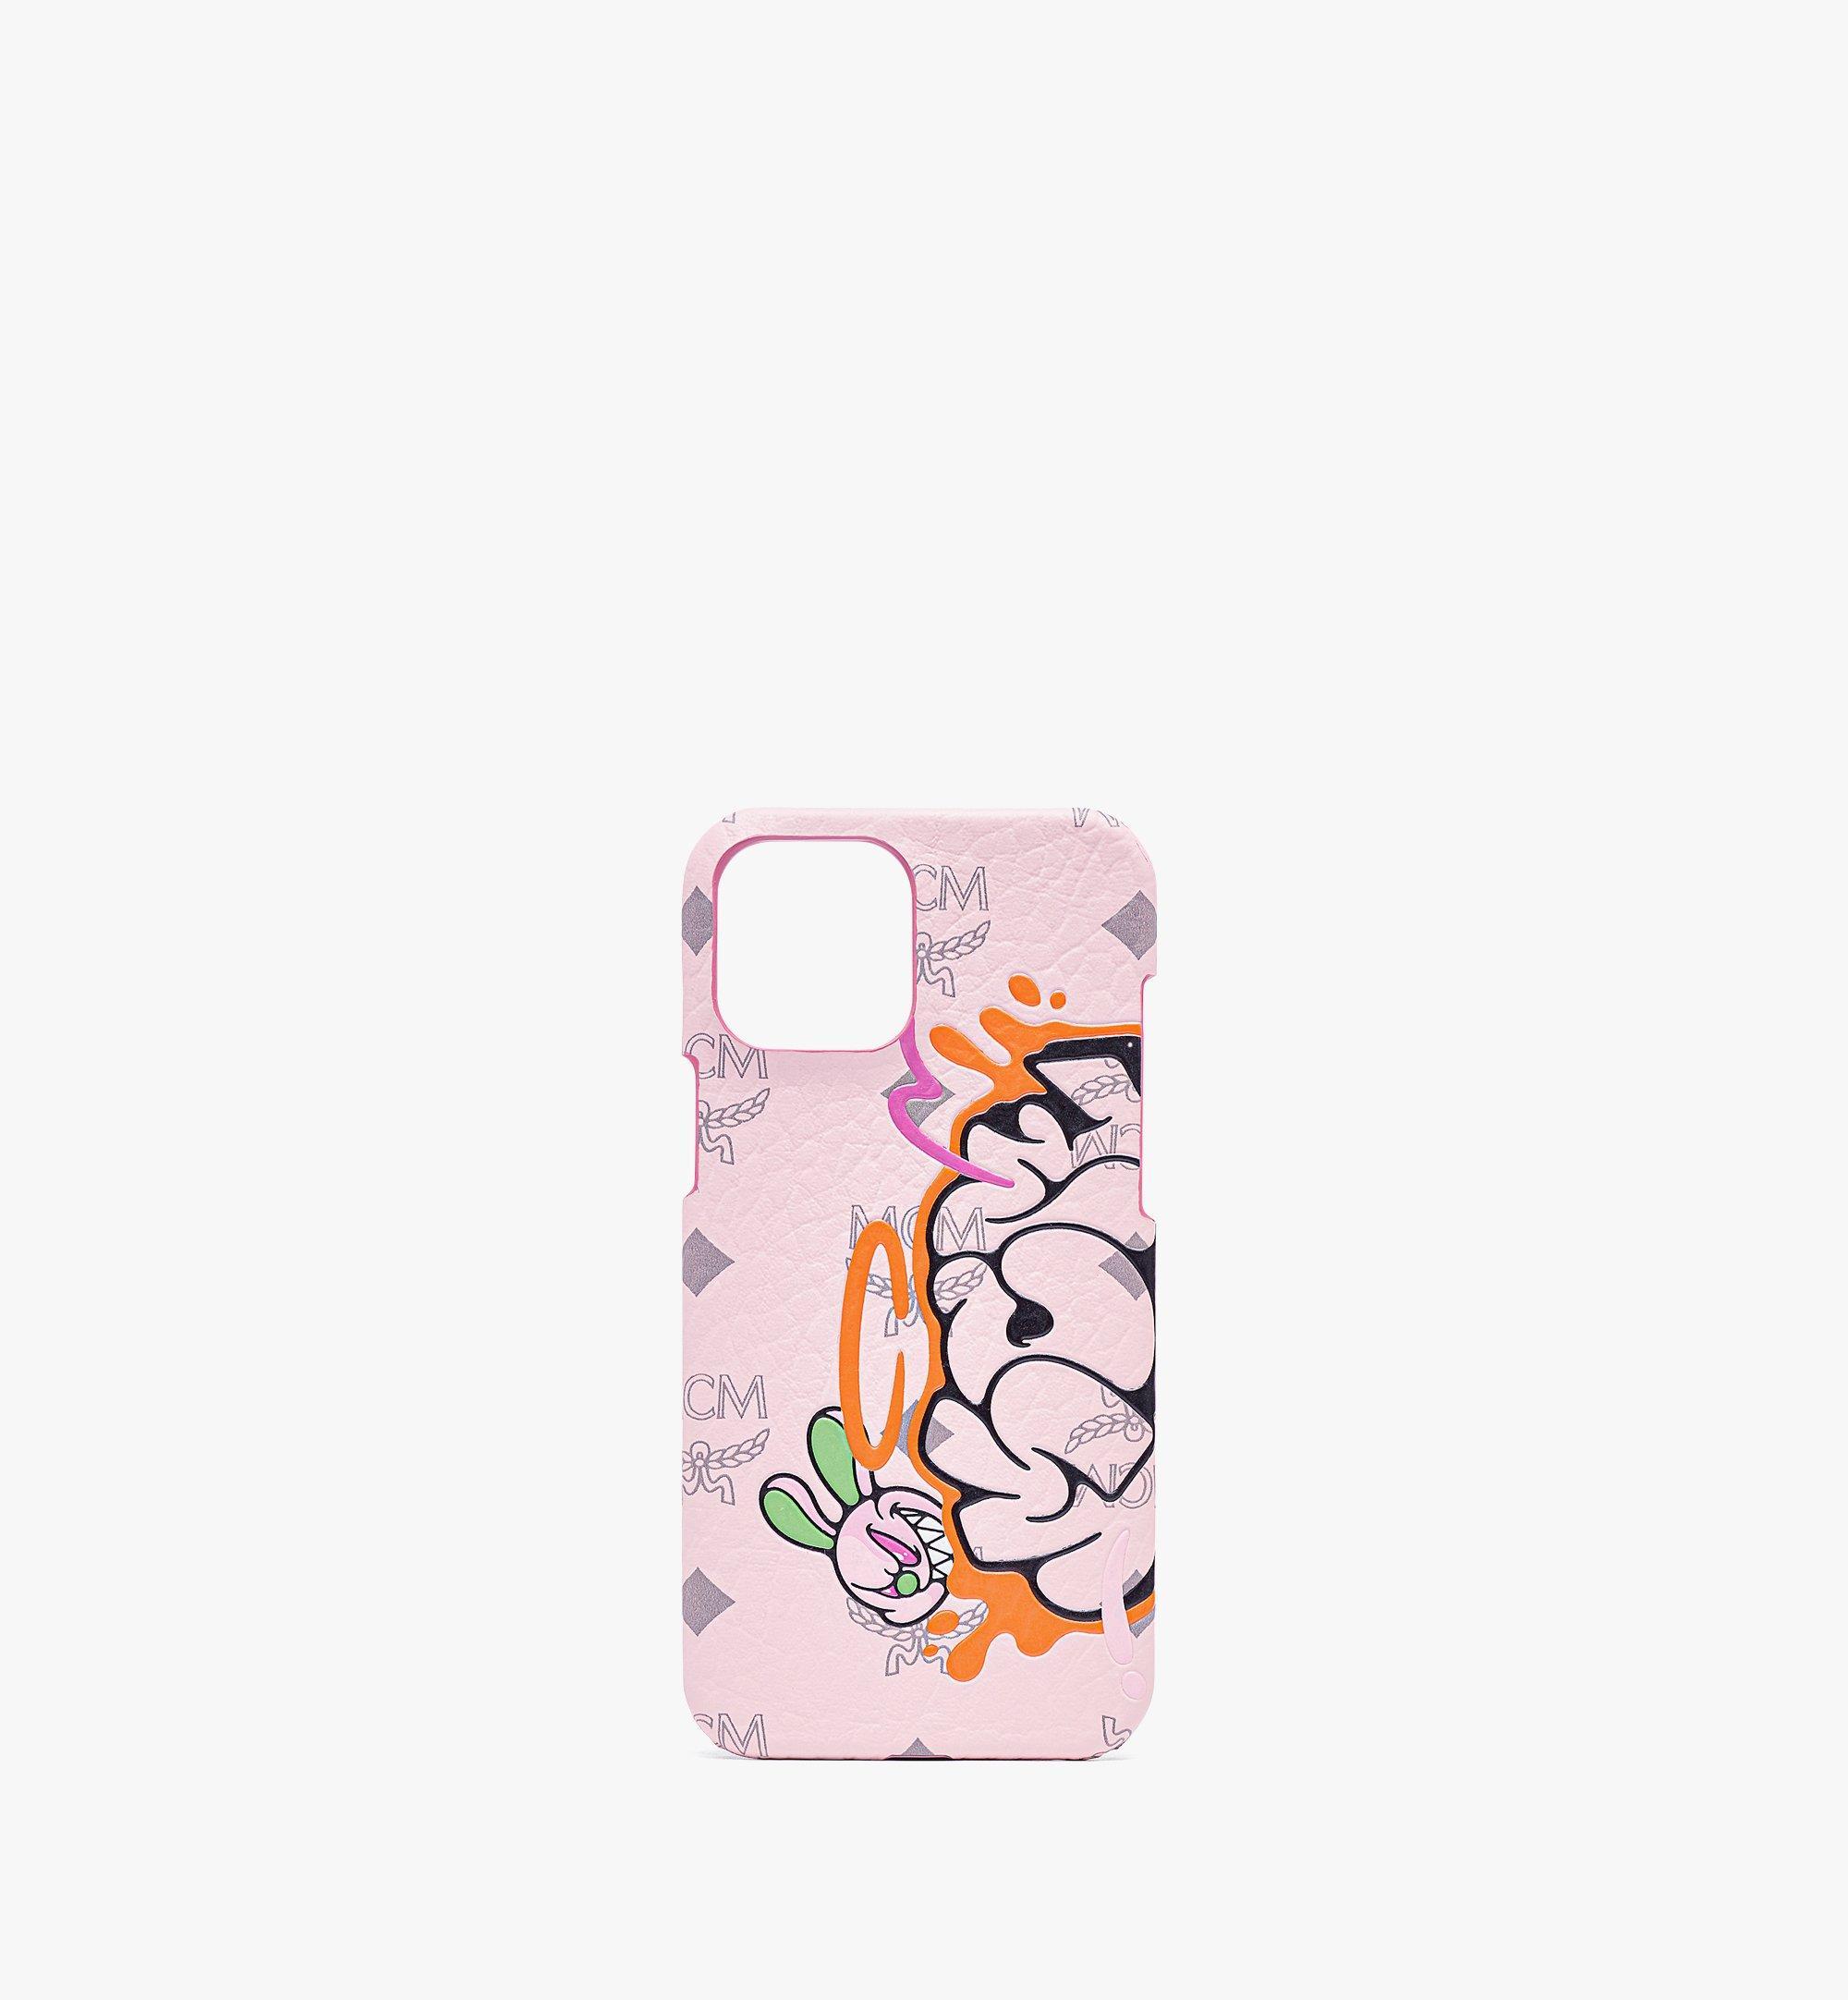 MCM MCM x SAMBYPEN iPhone 12 Pro Max Case in Visetos Pink MXEBASP04QH001 Alternate View 1